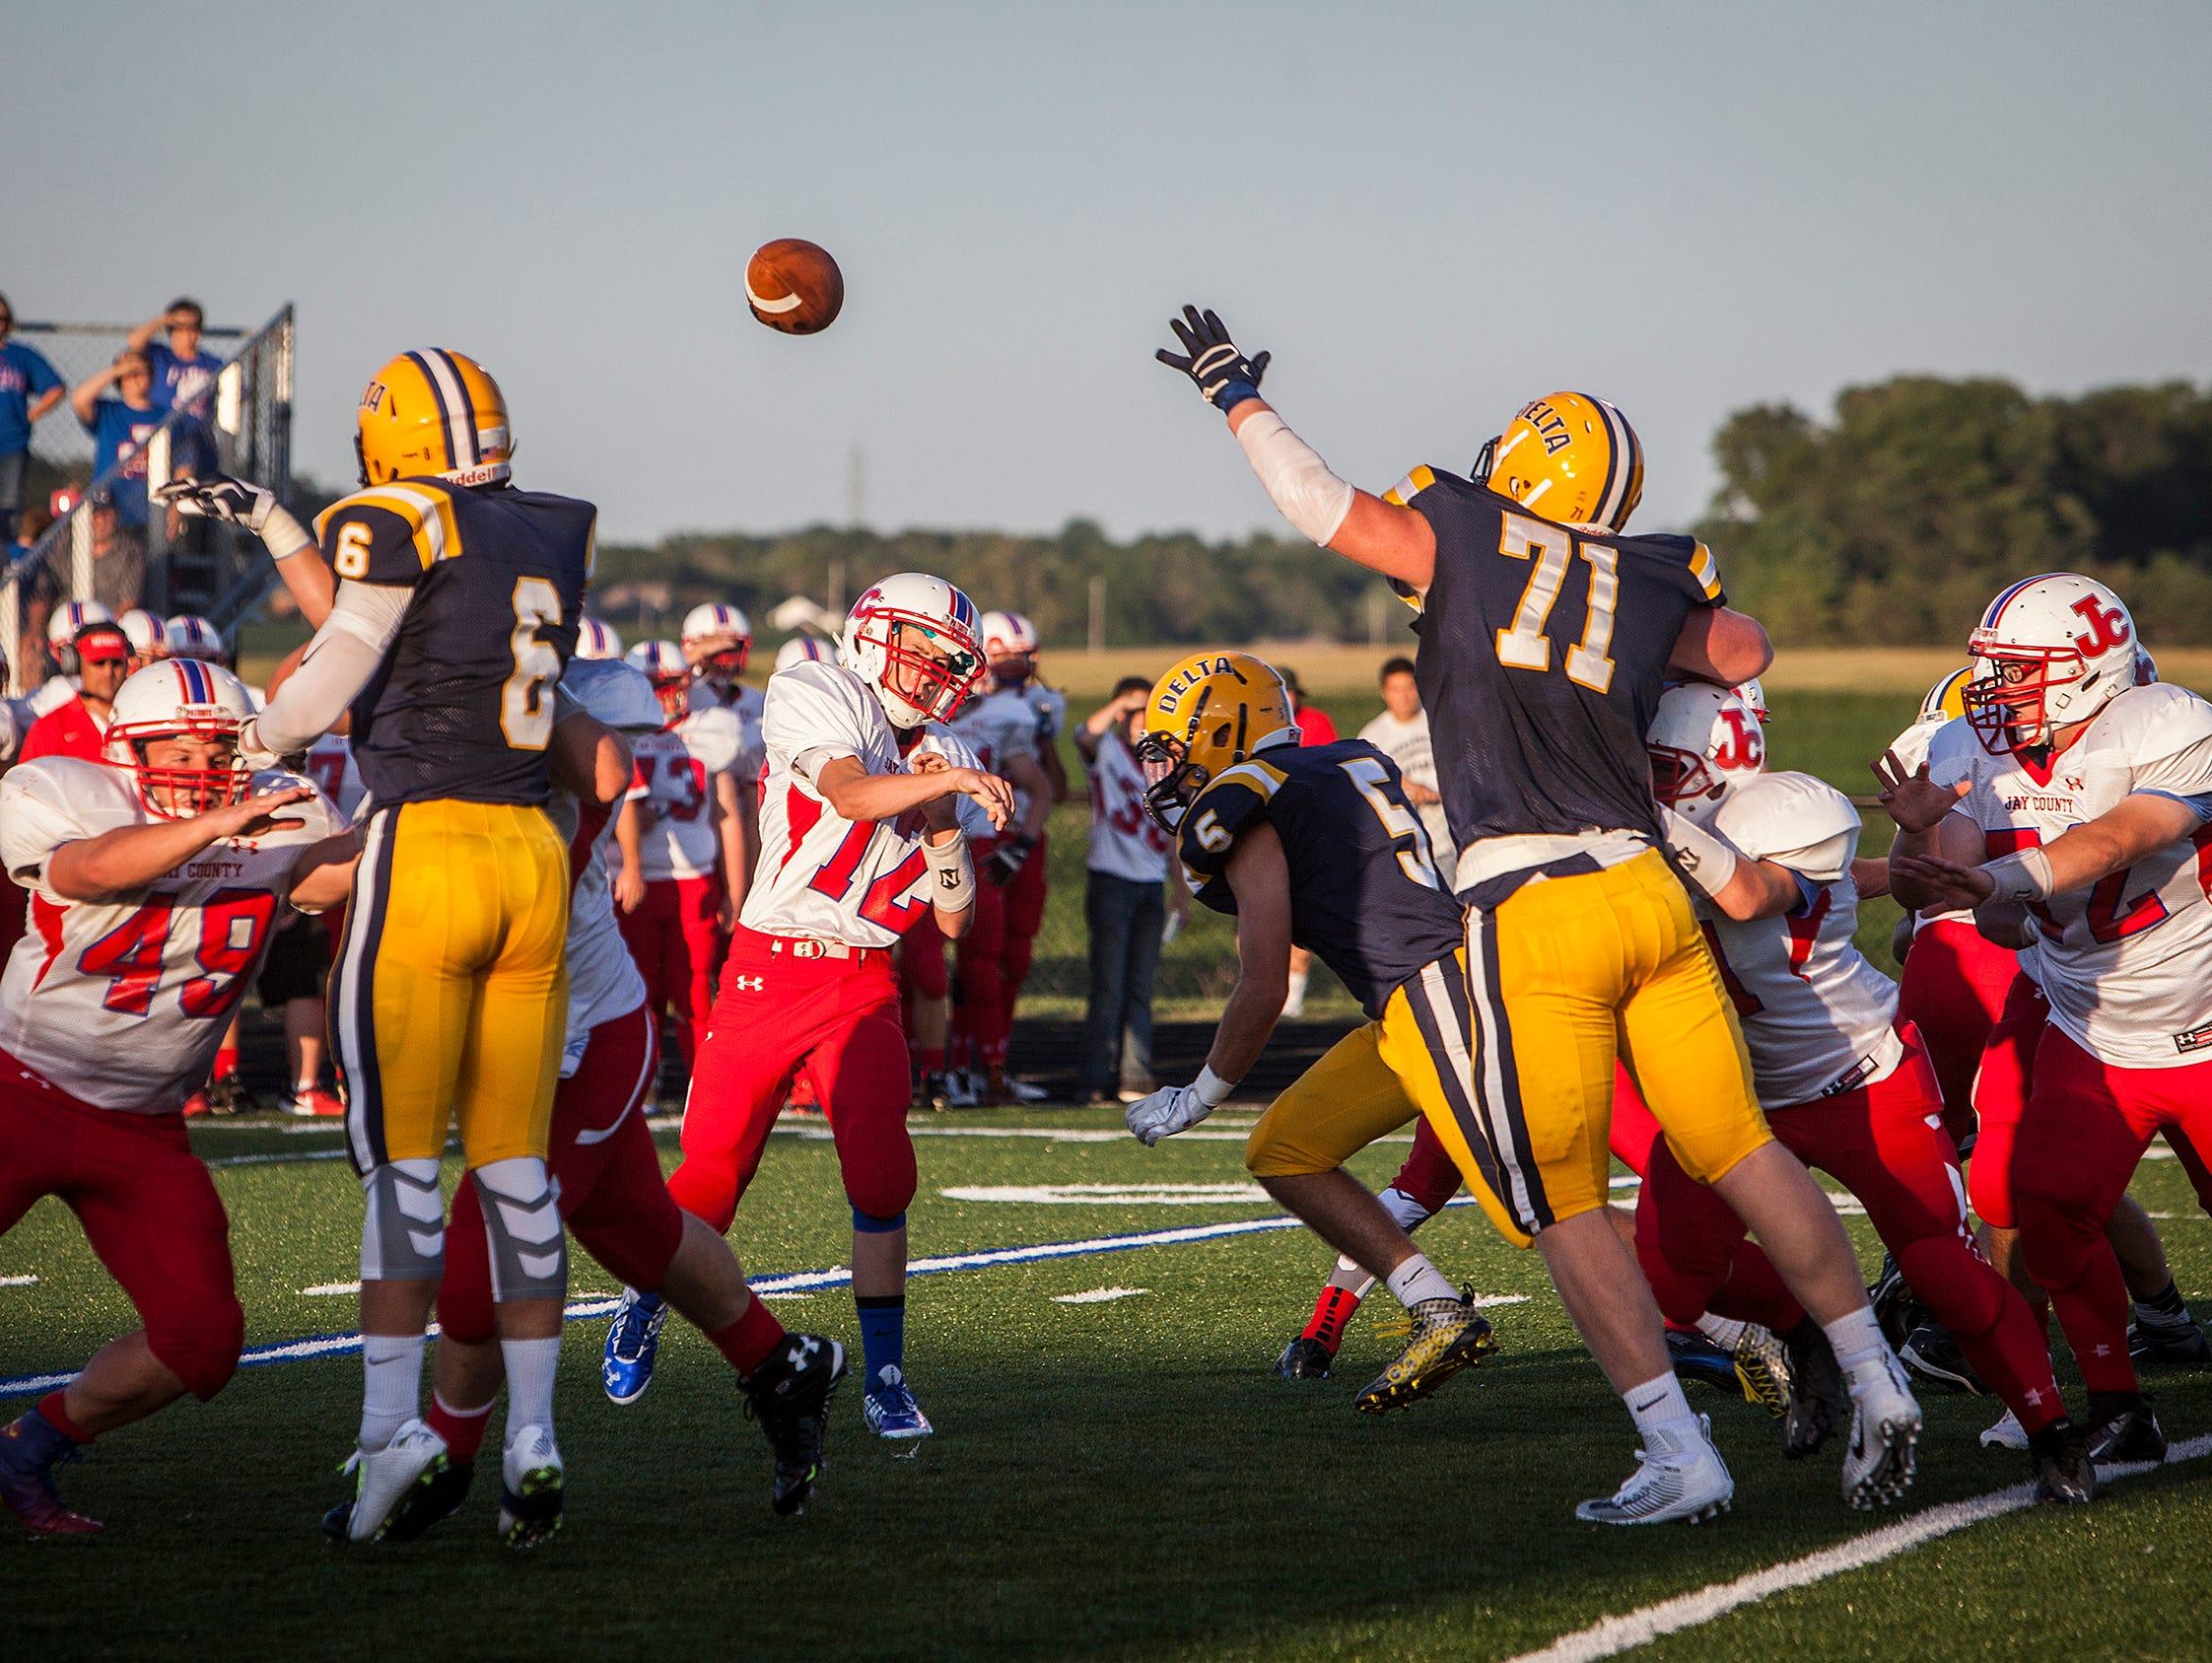 Delta defeats Jay County at Delta High School Friday evening. Kaleb Slaven Holton Hill Sam Williams